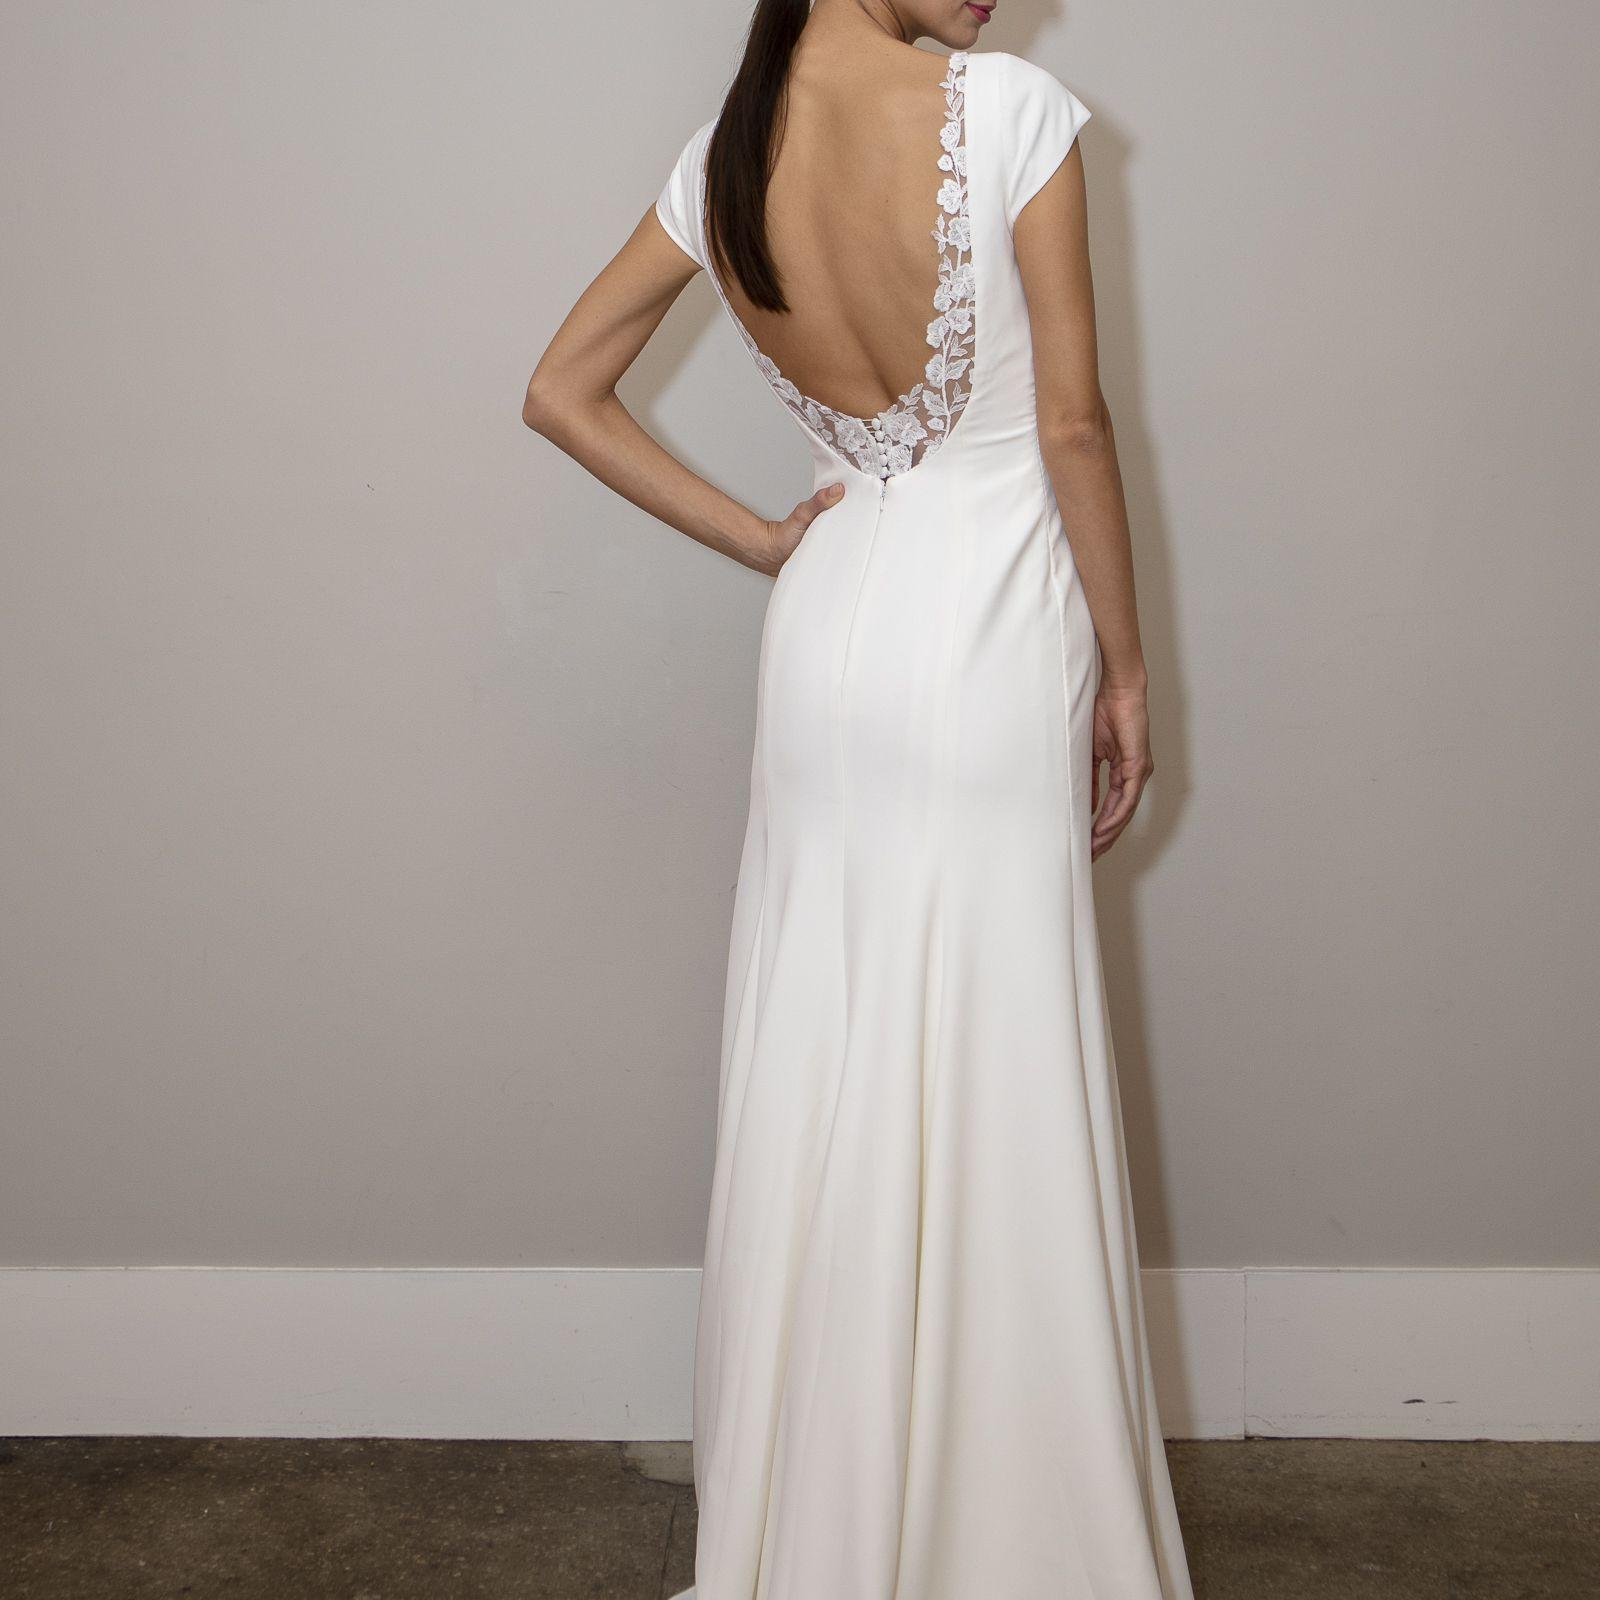 Gallery New Mira Zwillinger Wedding Dresses Spring 2019: BHLDN Bridal Fall 2019